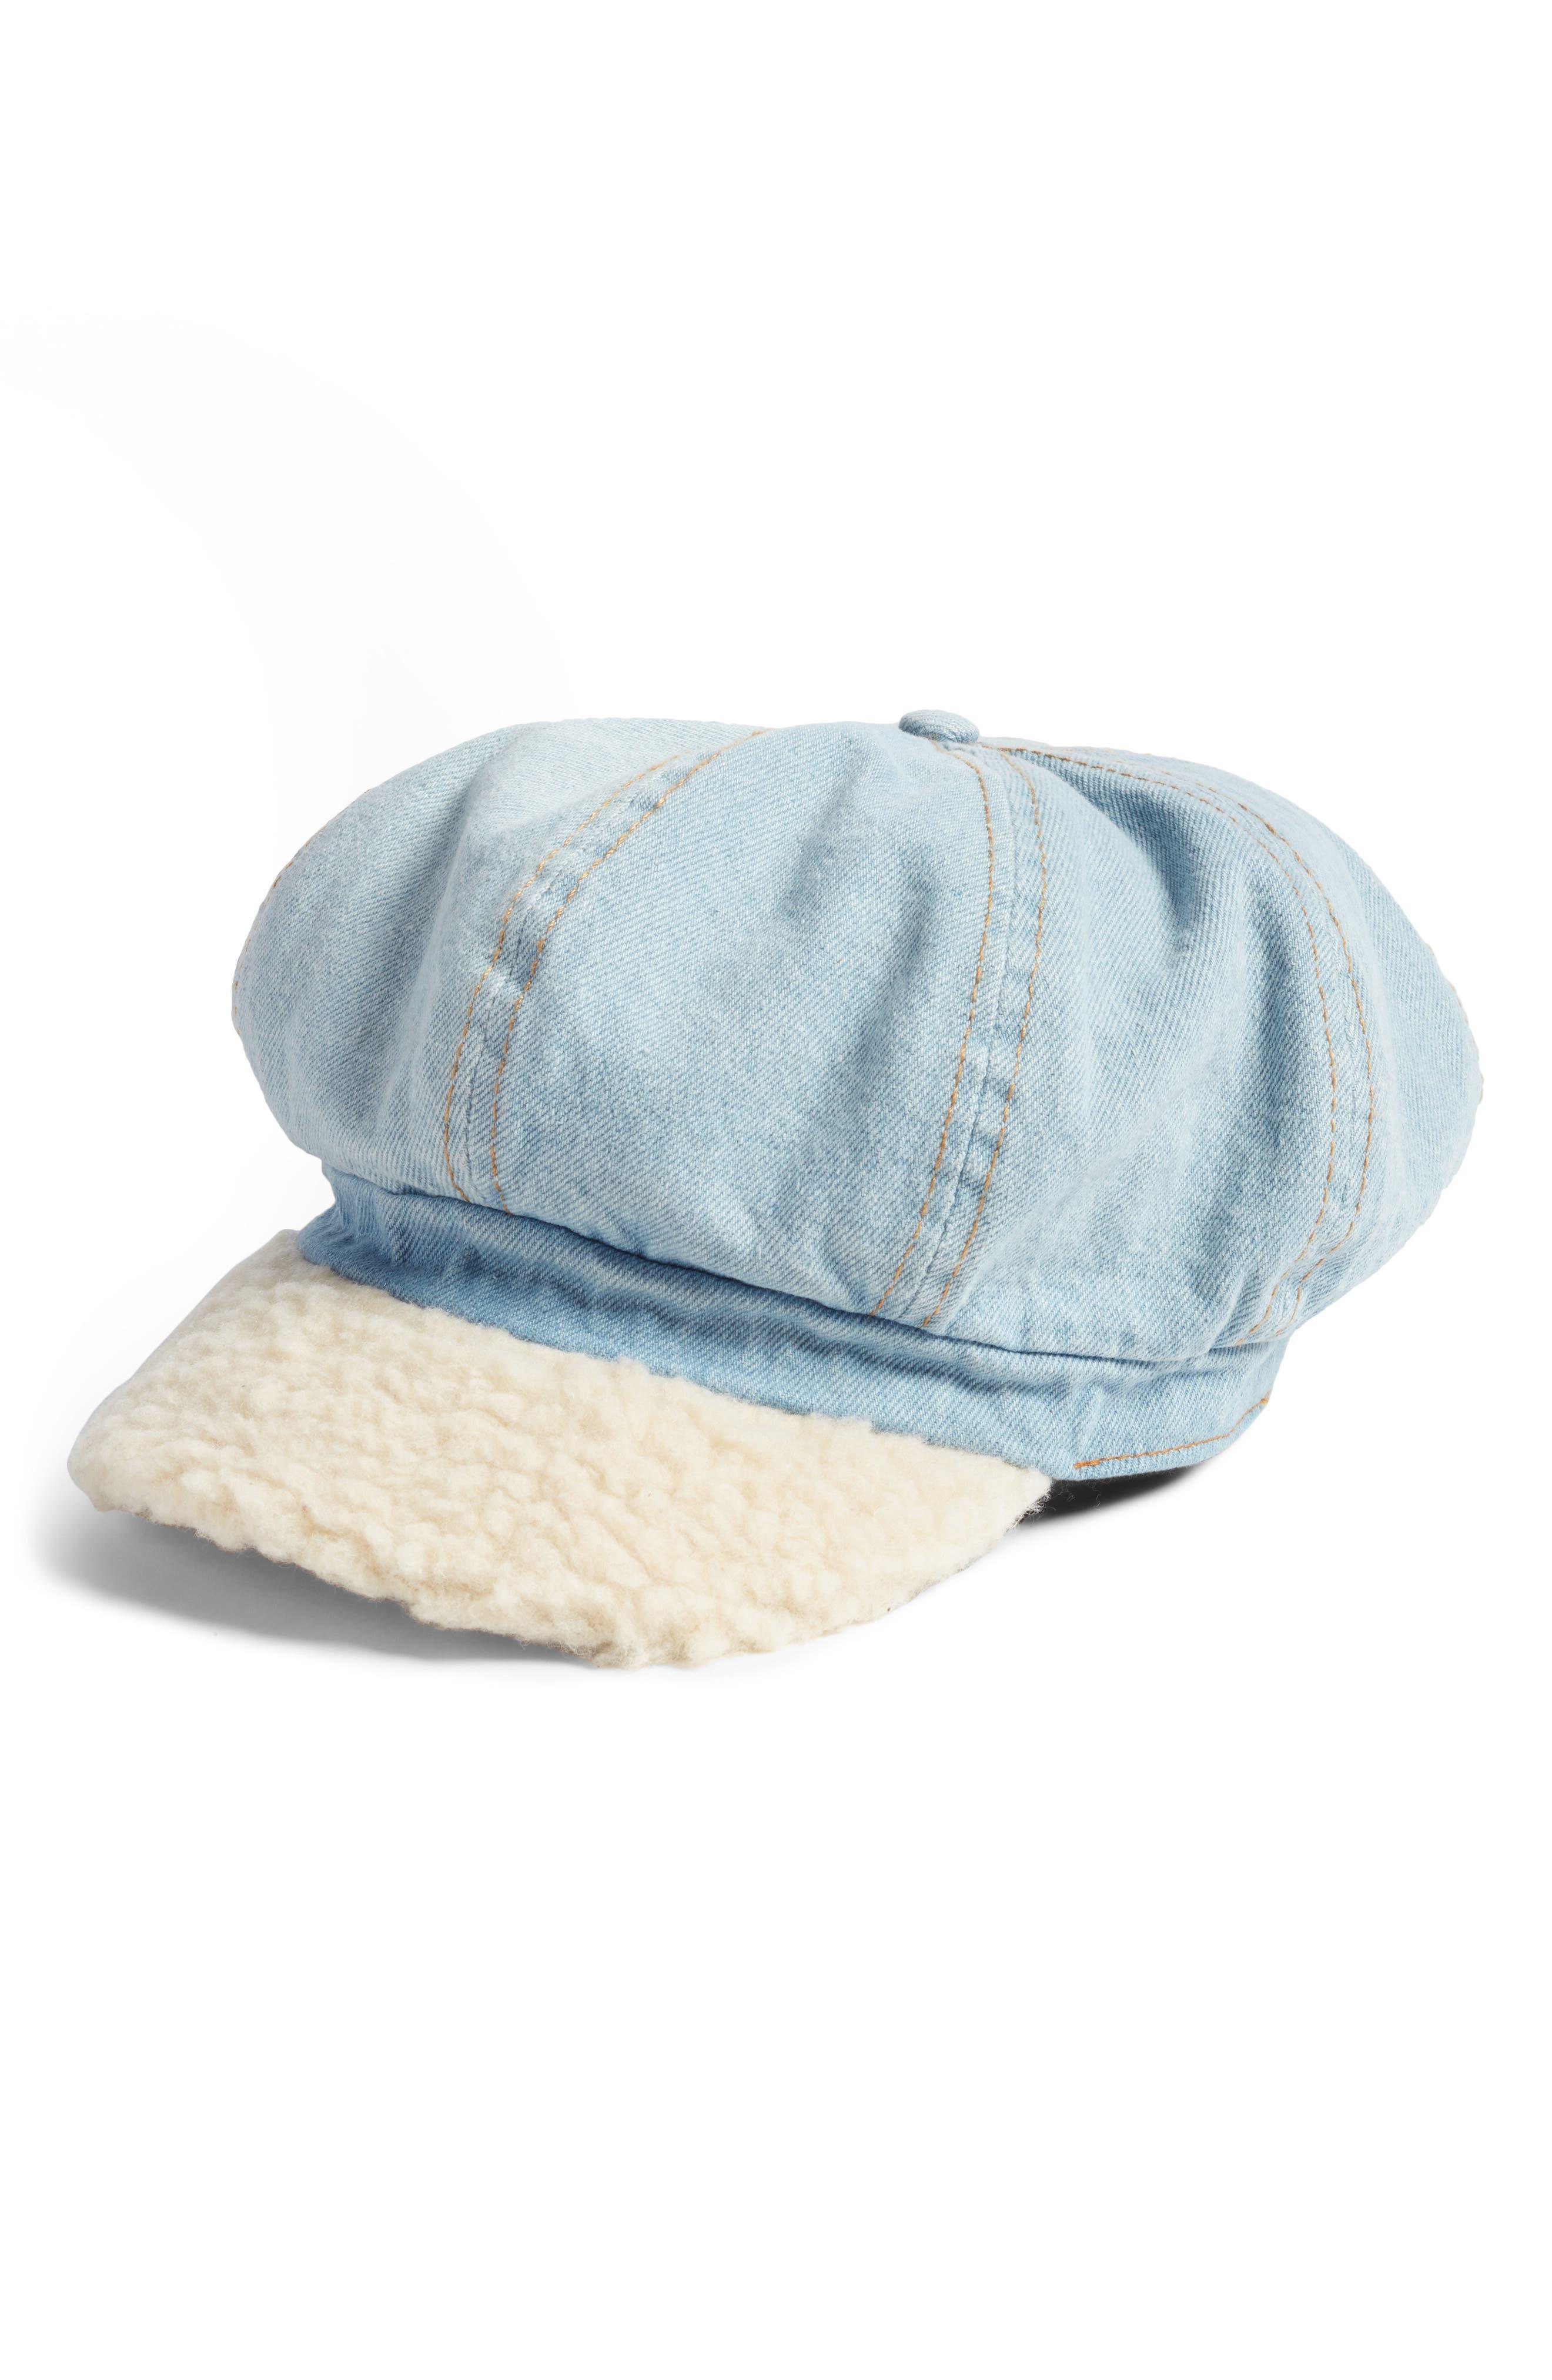 Faux Shearling & Denim Baker Boy Hat,                             Main thumbnail 1, color,                             400